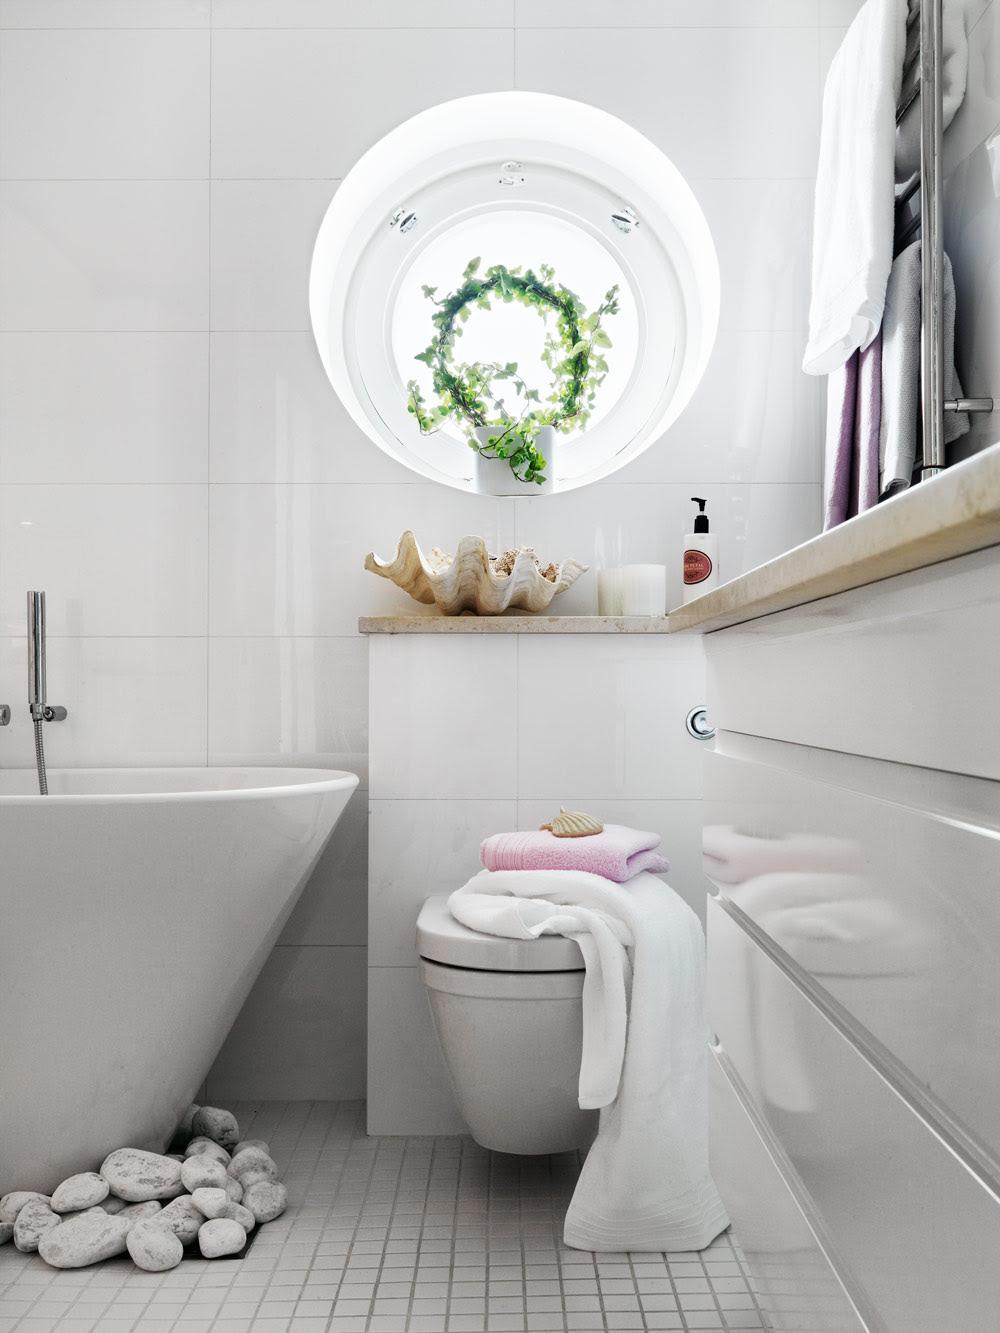 Stylish Small Bathroom With An Unusual Decor | DigsDigs